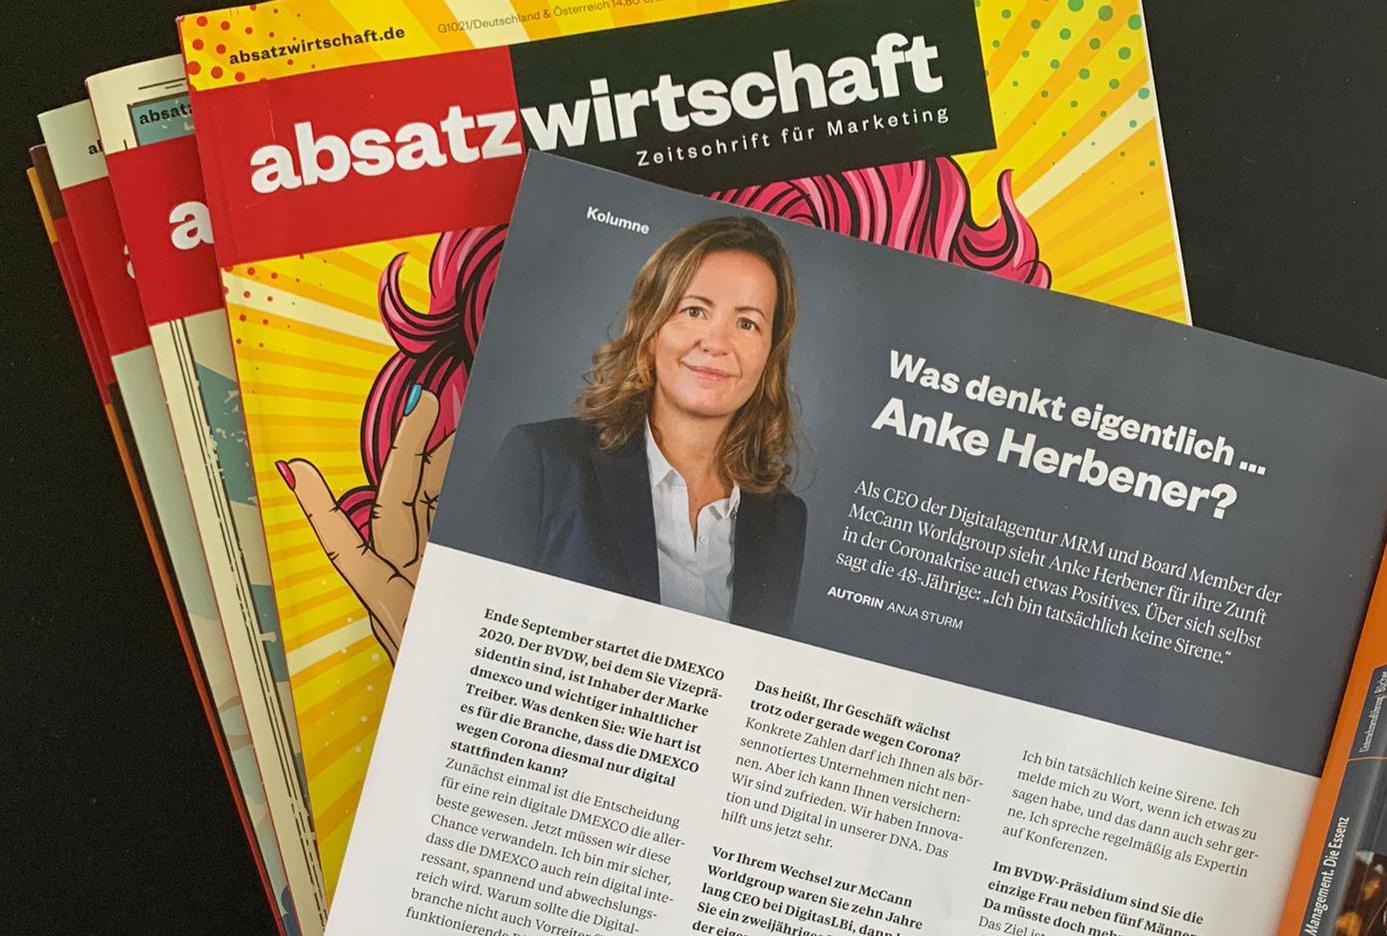 Was denkt eigentlich ... Anke Herbener?